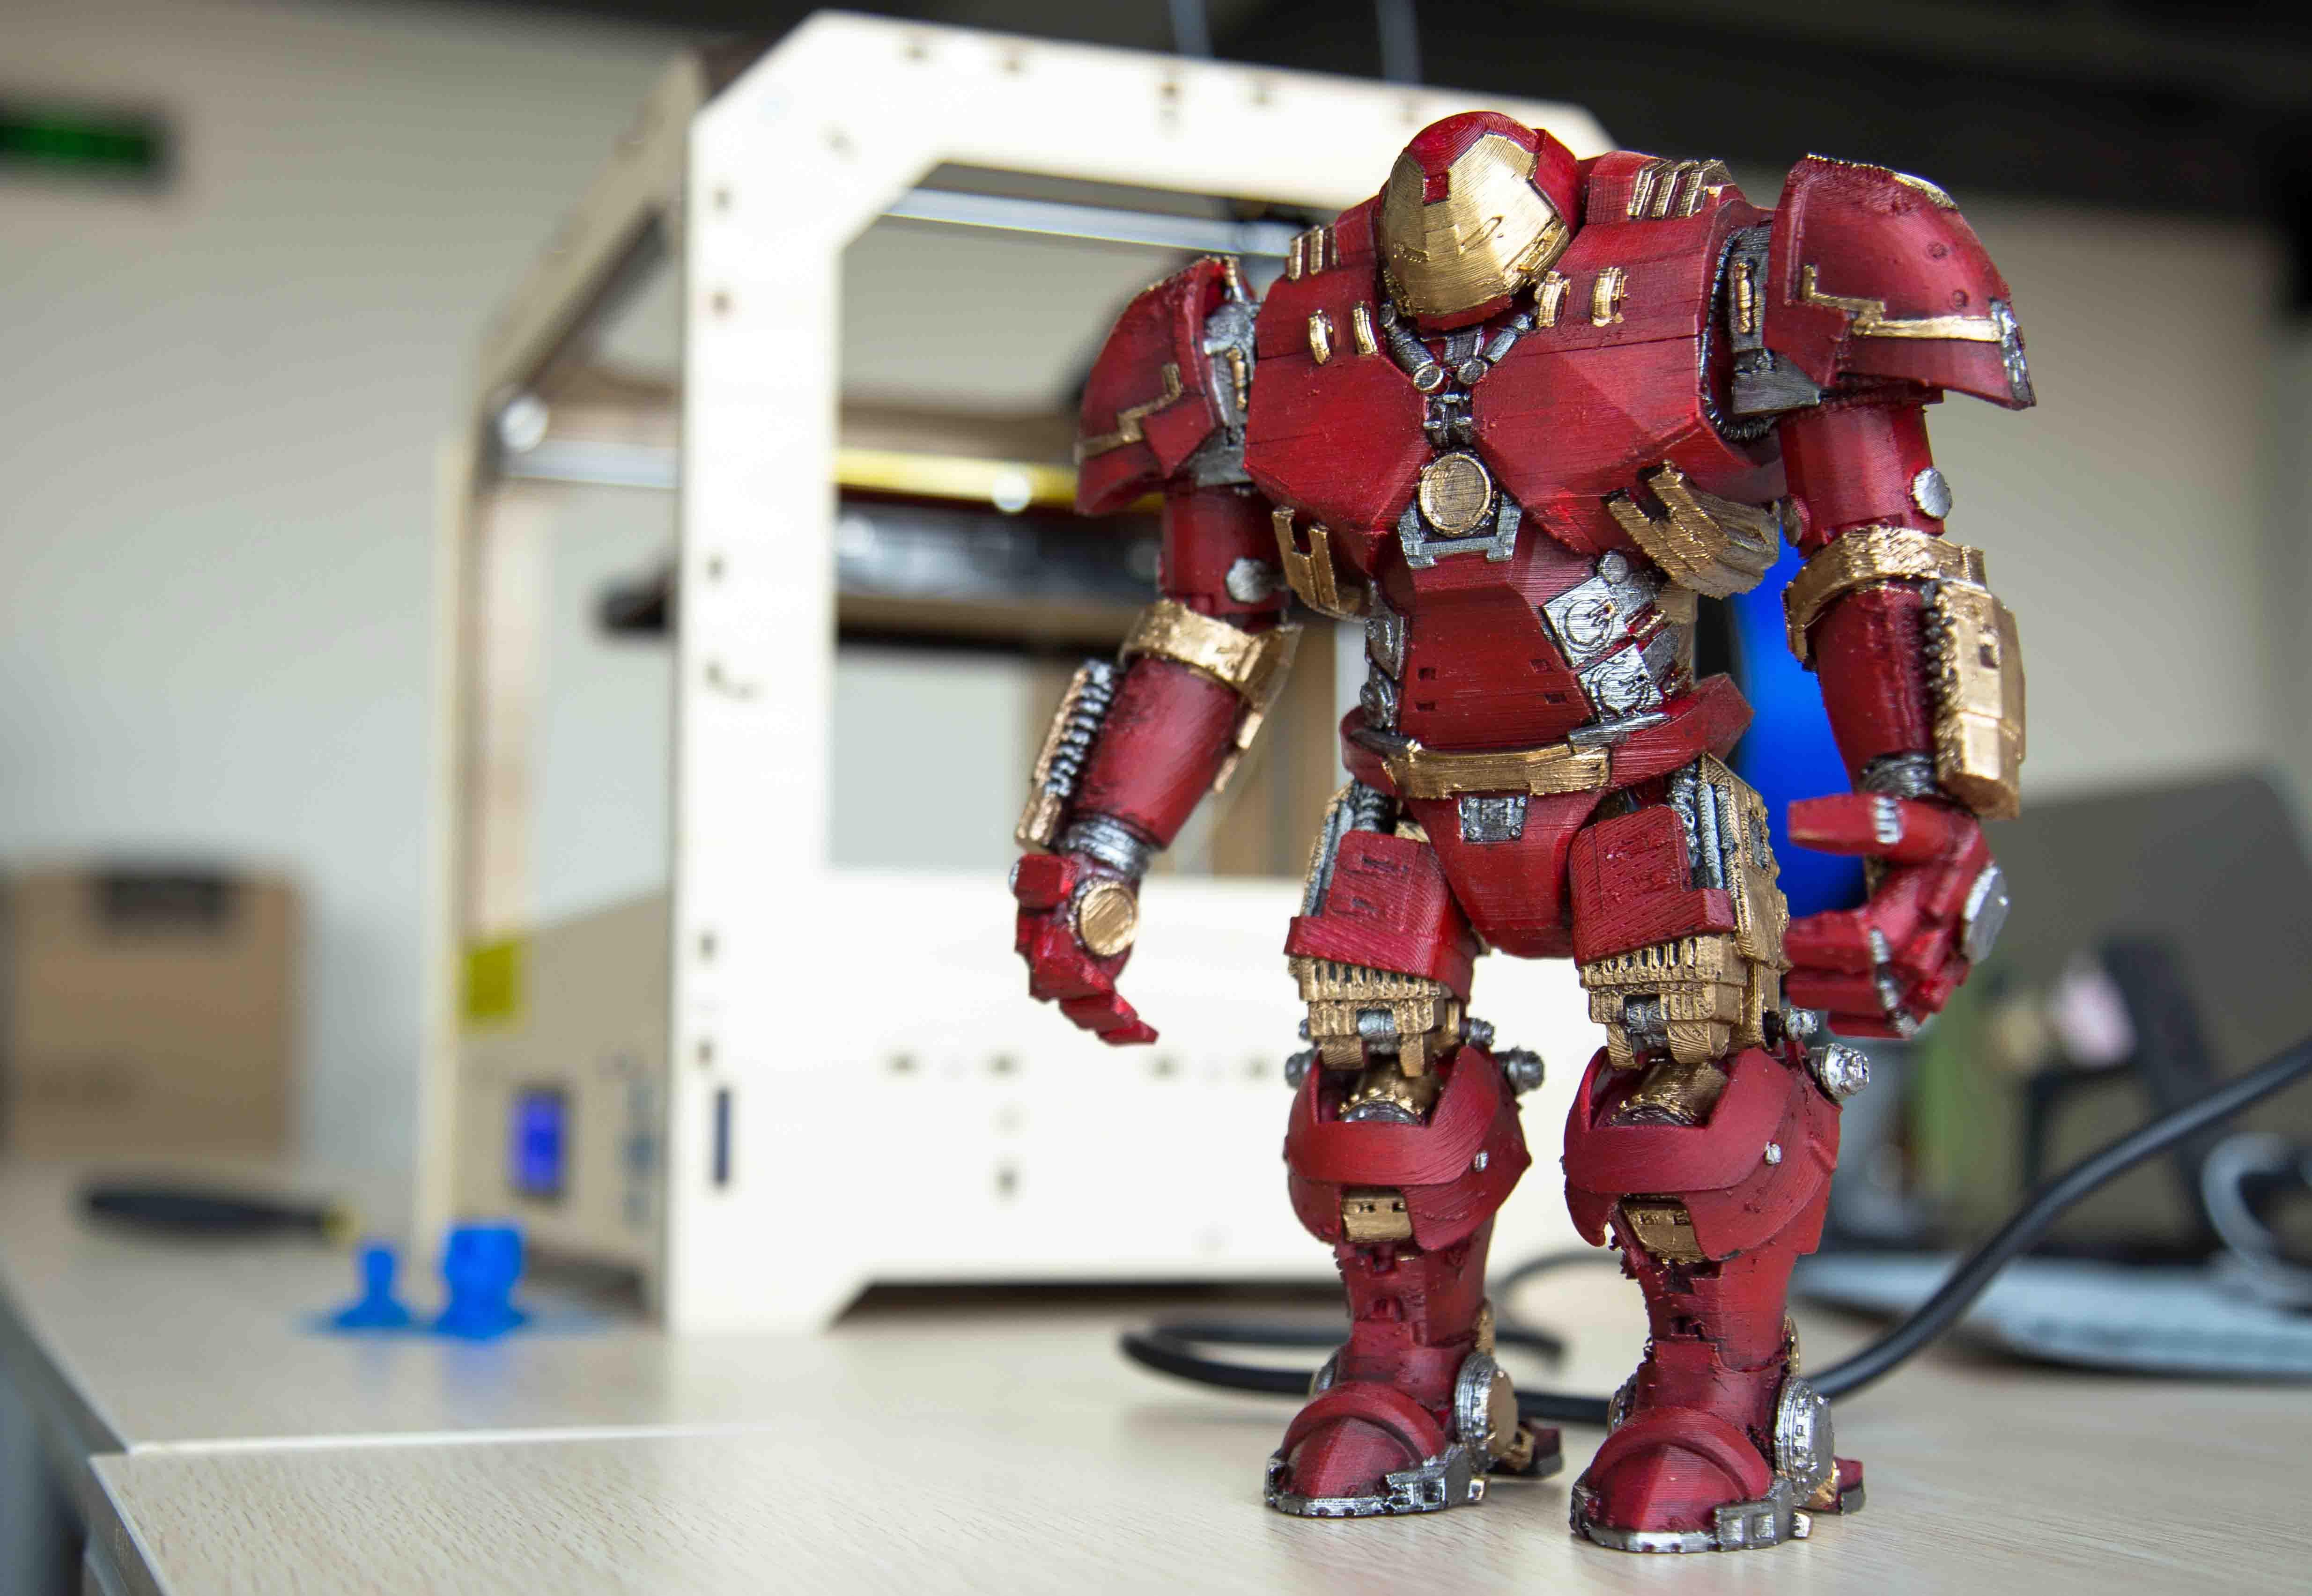 3D PRINTED IRON MAN ANYONE? - Gambody, 3D Printing Blog